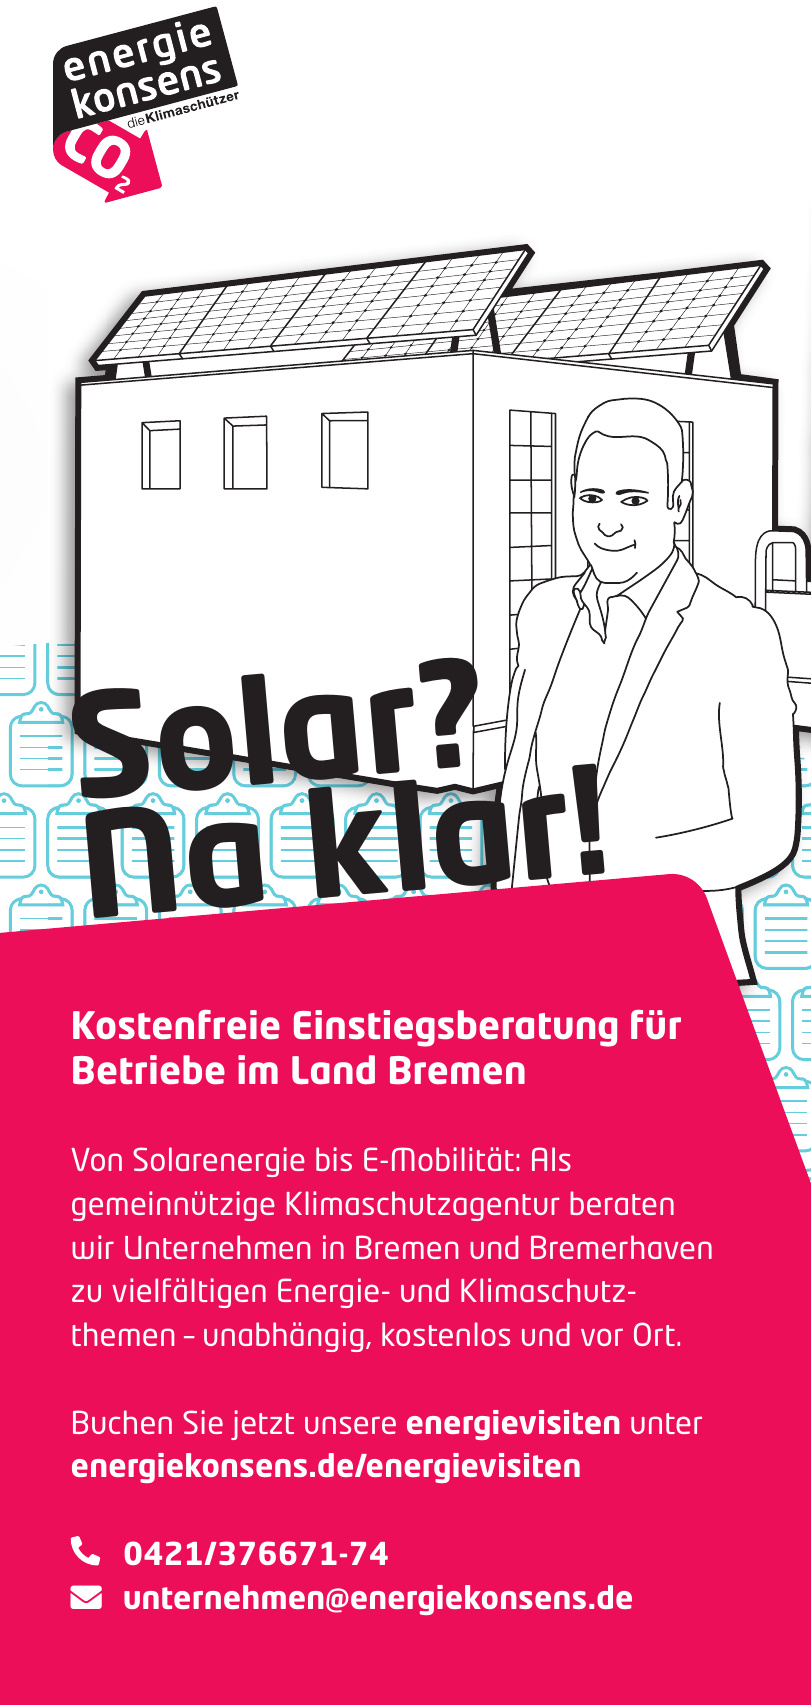 Bremer Energie-Konsens GmbH